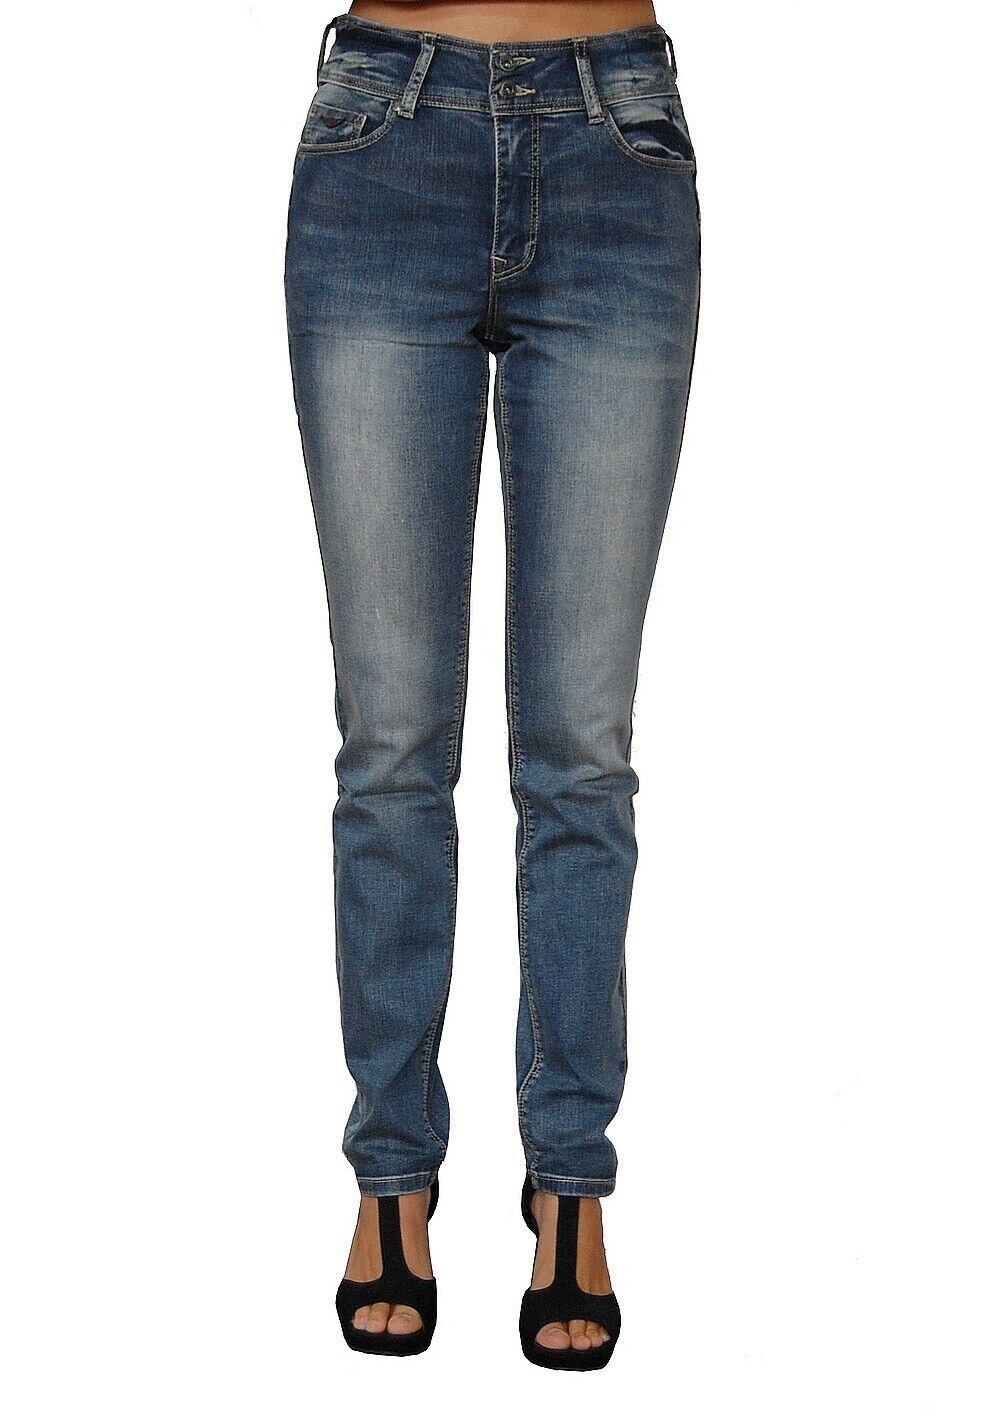 Arizona High Waist Push Up Jeans Stretch Slim Mid Blue Damen Hose 2.Wahl Gr.44